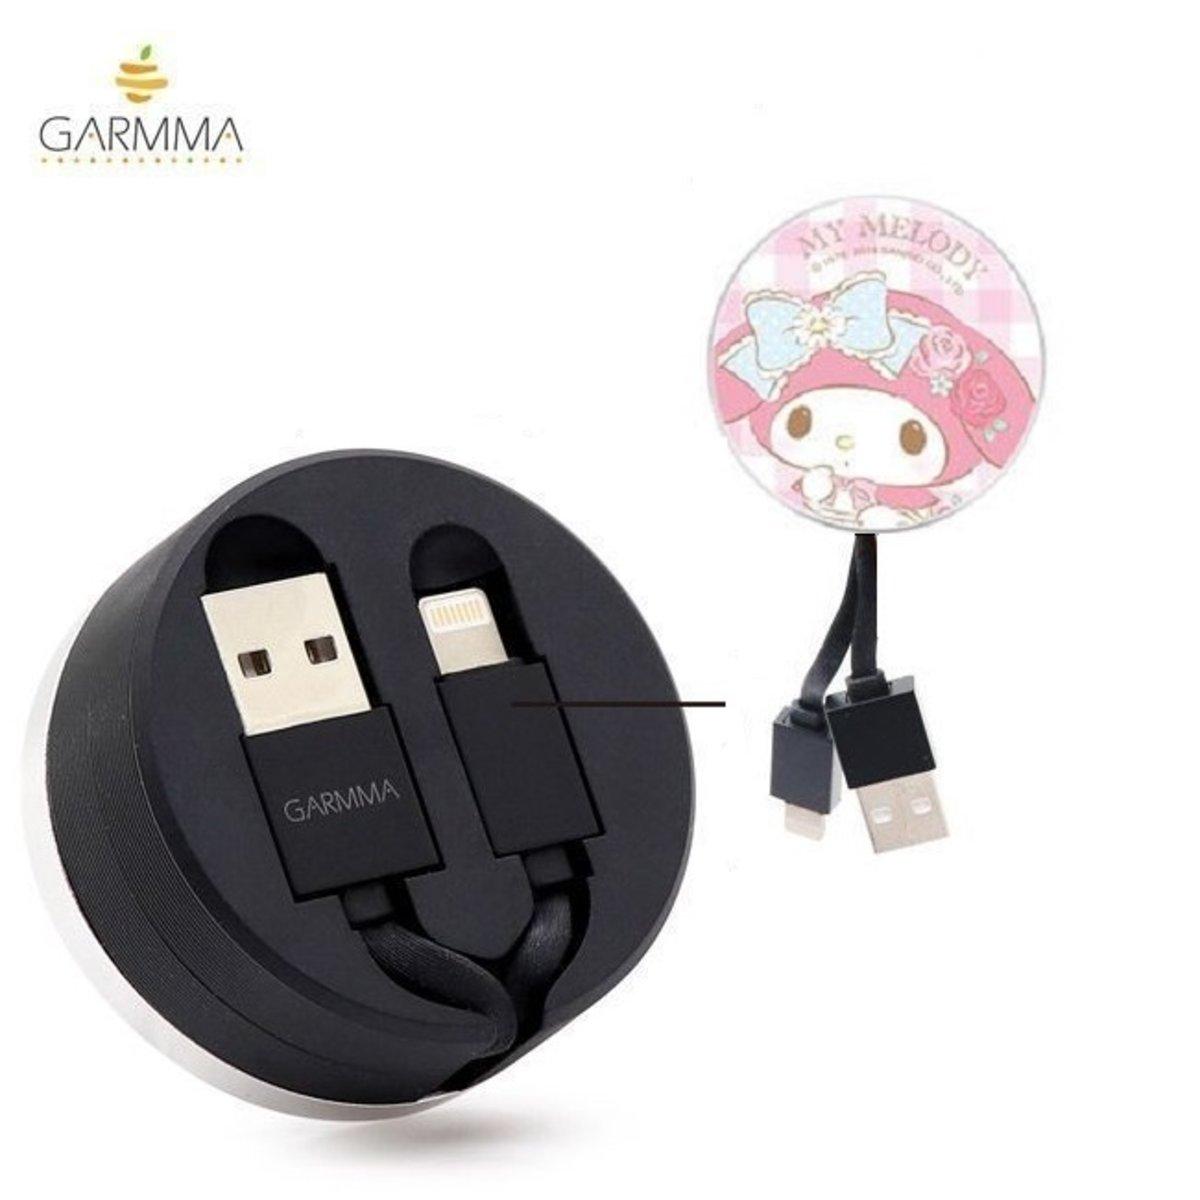 Sanrio My Melody 伸縮 USB 充電 數據傳輸線(Apple專用) 4710150863474